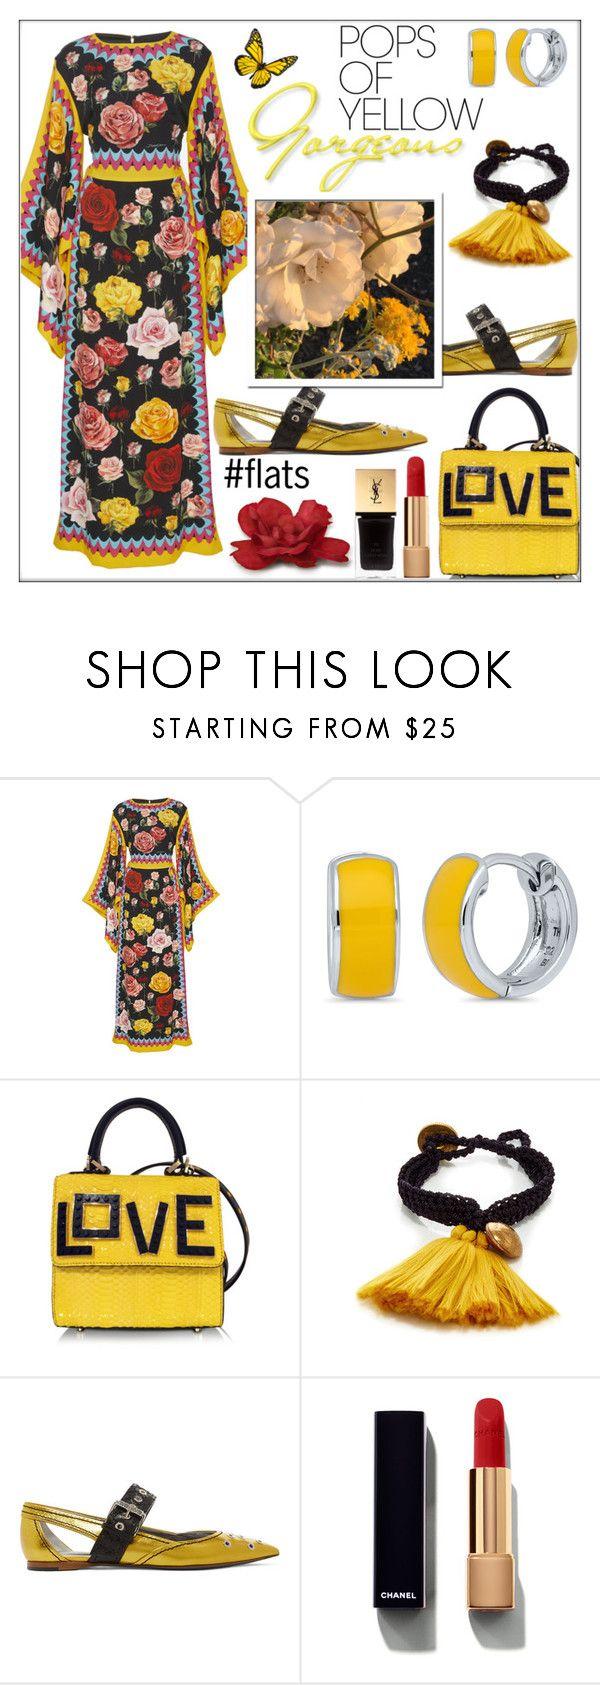 """Get Happy: Pops of Yellow"" by pat912 ❤ liked on Polyvore featuring Dolce&Gabbana, BERRICLE, Les Petits Joueurs, Daniela Bustos Maya, Bottega Veneta, Chanel, Yves Saint Laurent, polyvoreeditorial and PopsOfYellow"